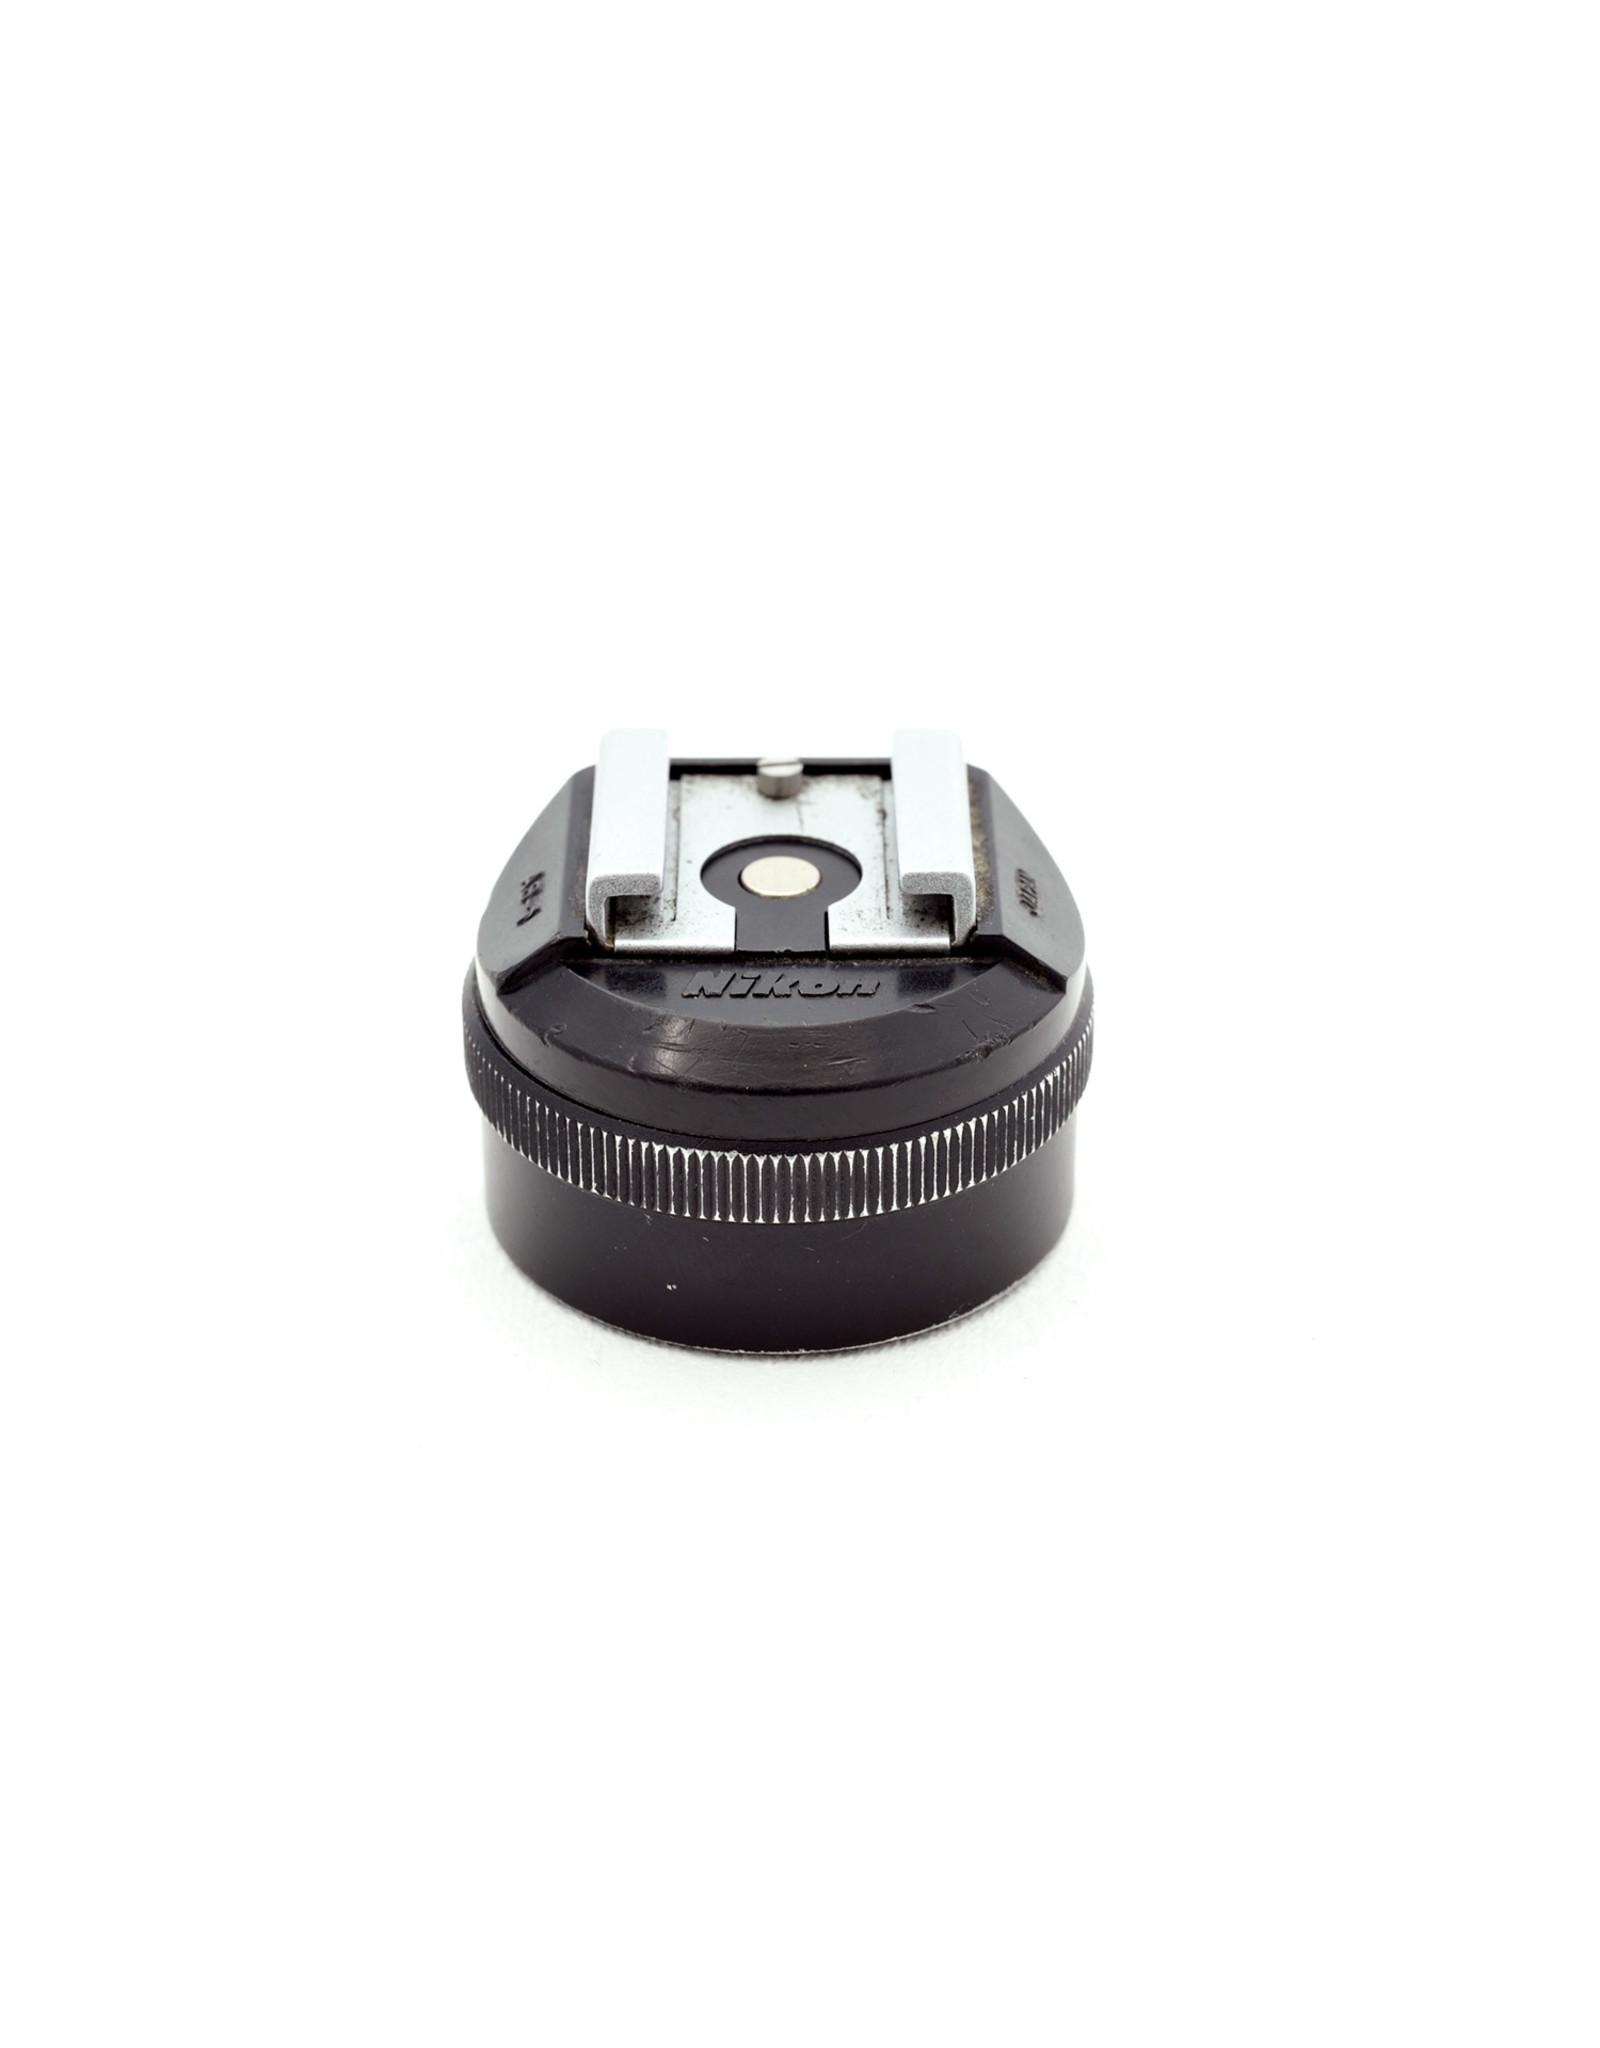 Nikon Nikon AS-1 Flash Coupler (Nikon F2)   AP1010501